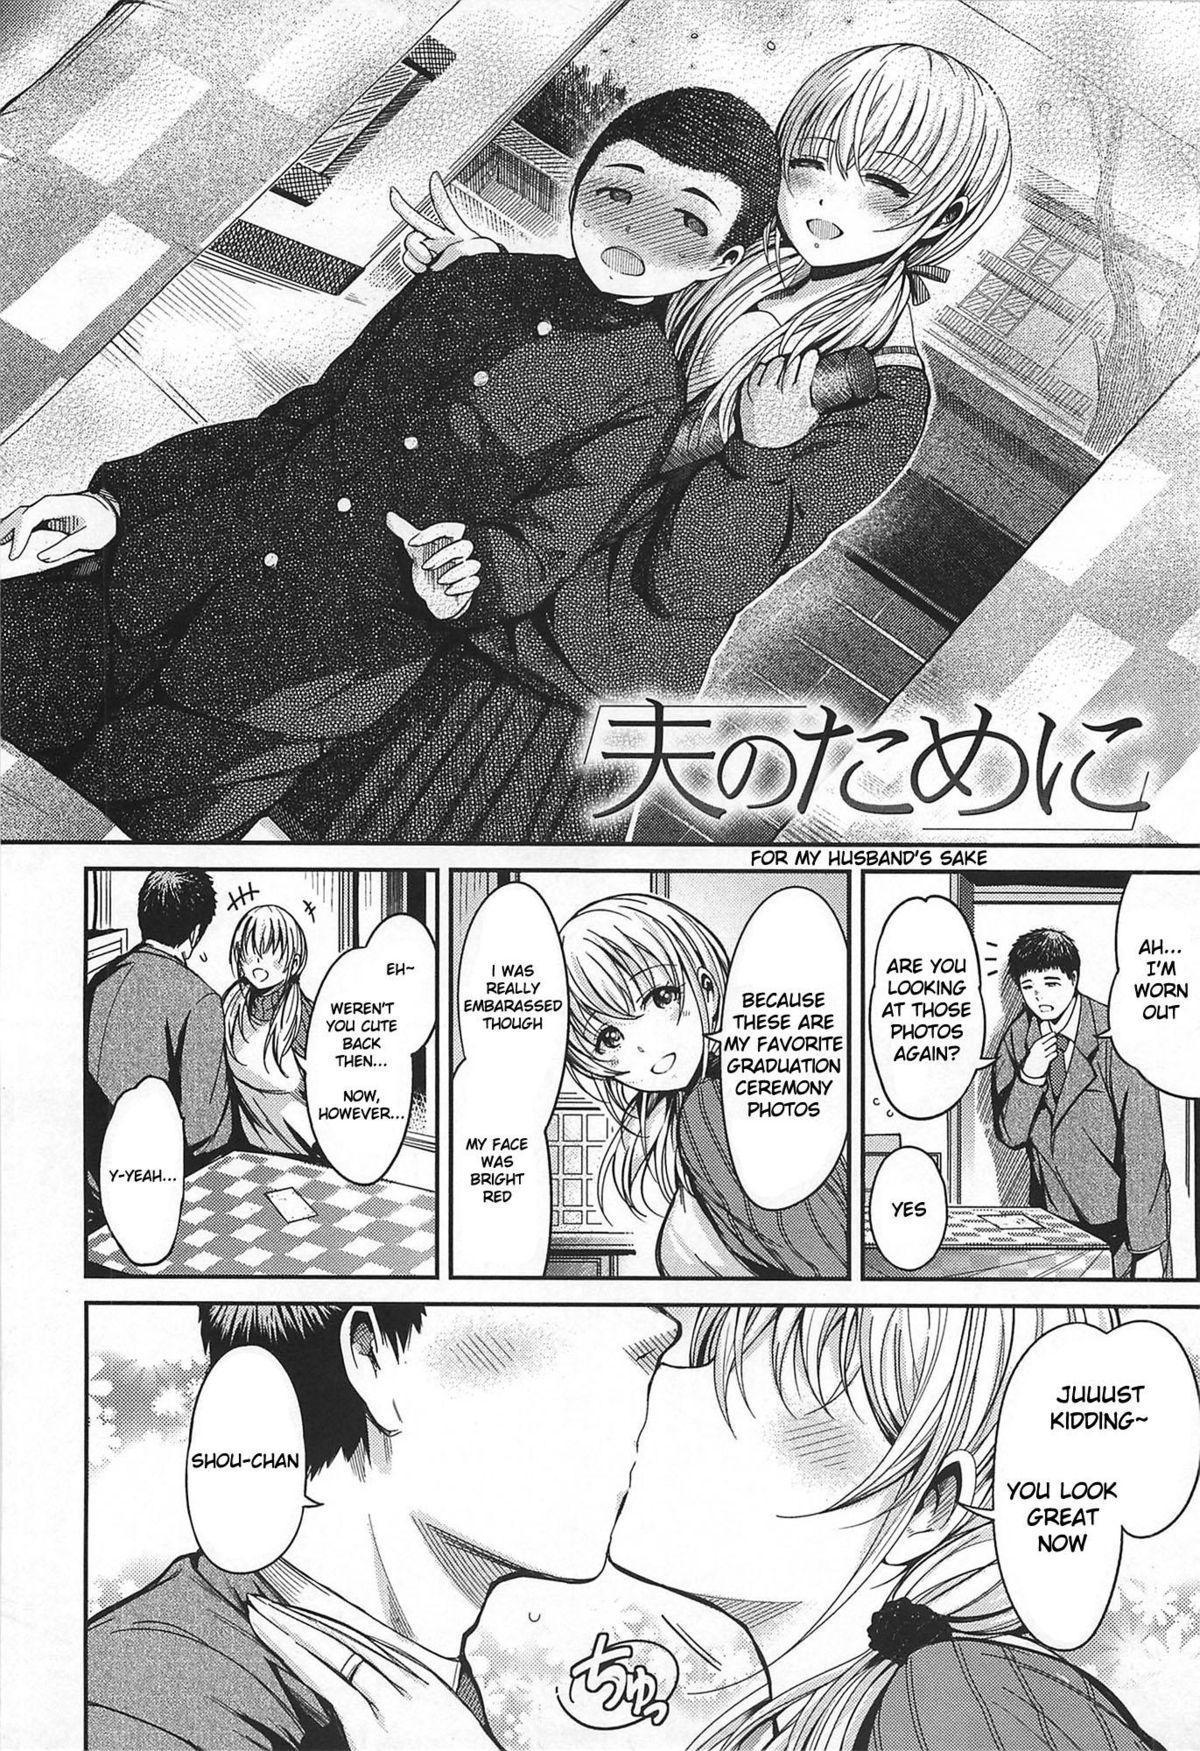 [Ichimatsu] [For my Husband's Sake] 1